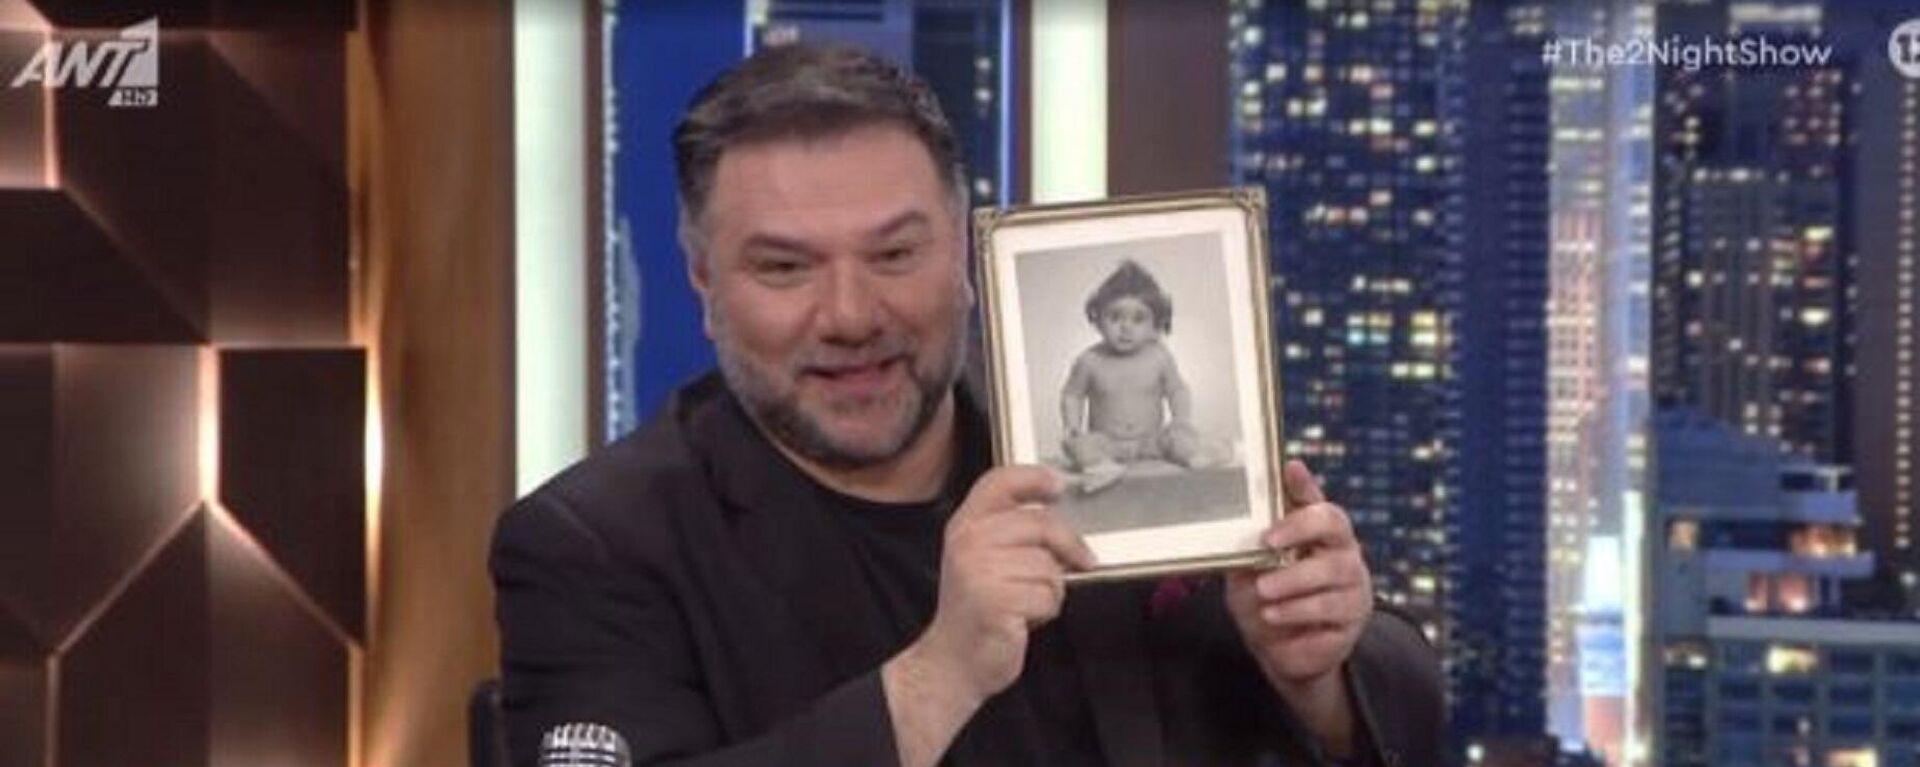 O Γιώργος Σουξές μωρό - Sputnik Ελλάδα, 1920, 08.09.2021